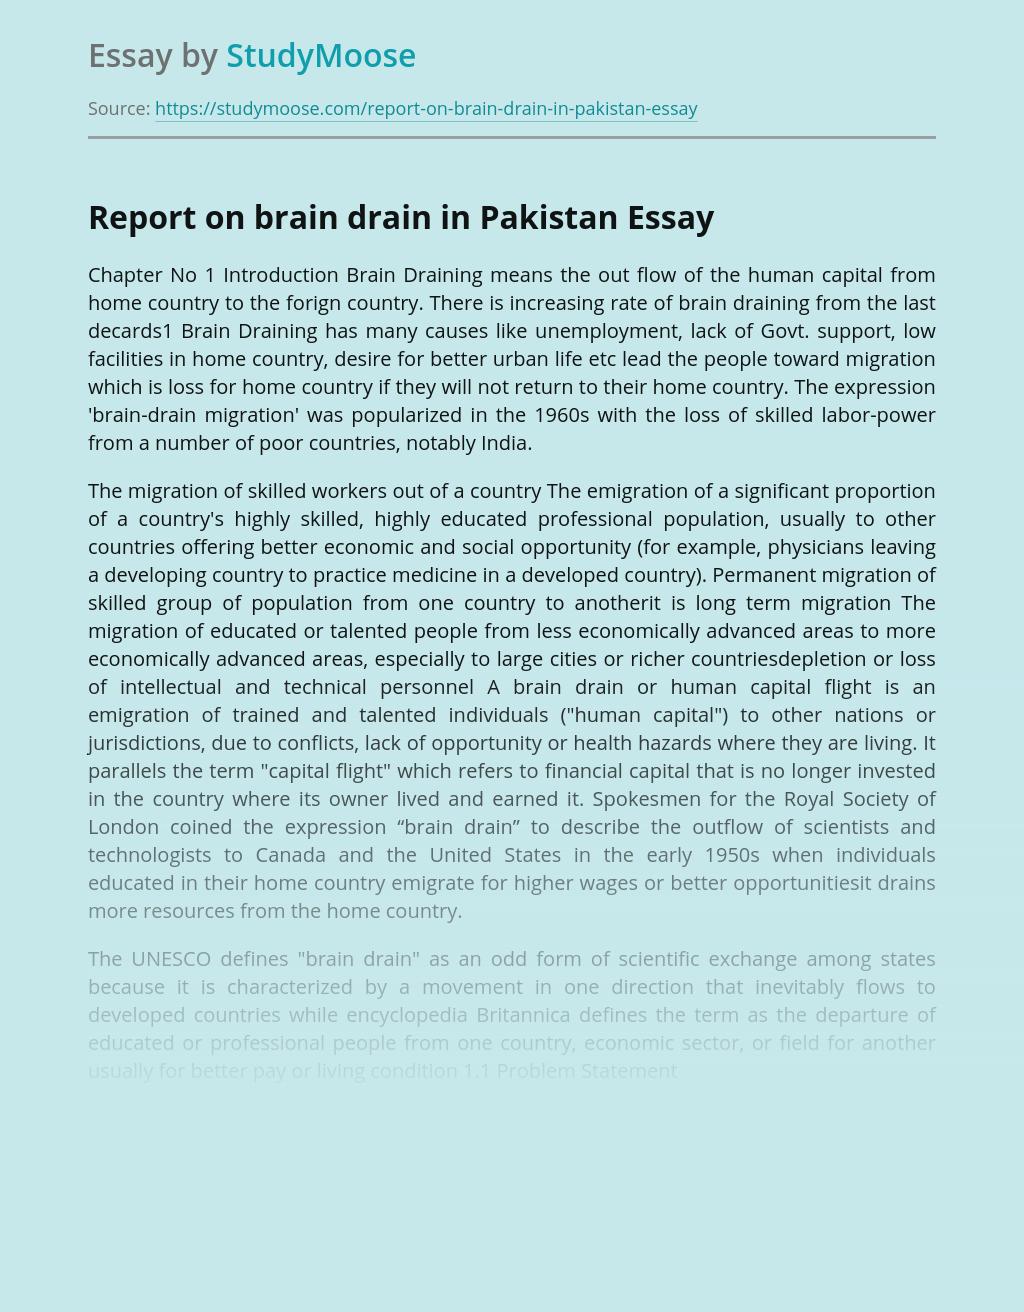 Report on brain drain in Pakistan